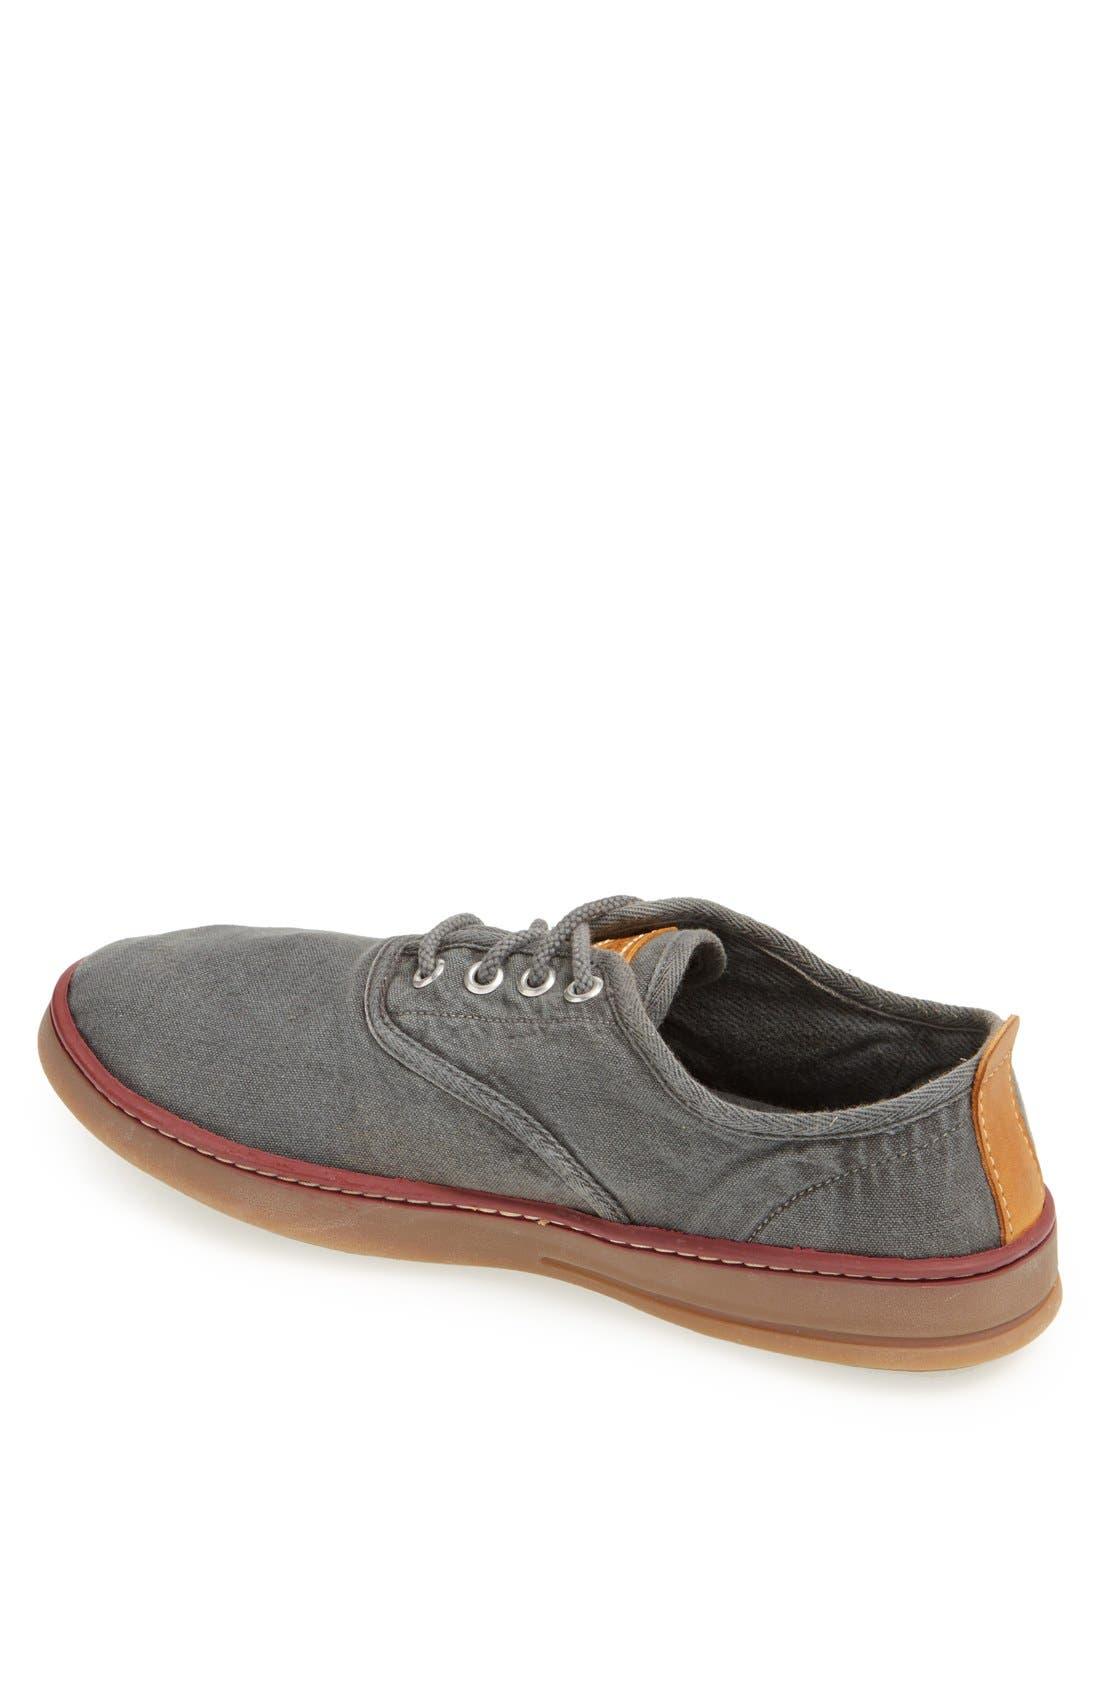 Alternate Image 2  - Timberland Earthkeepers® 'Hookset' Oxford Sneaker